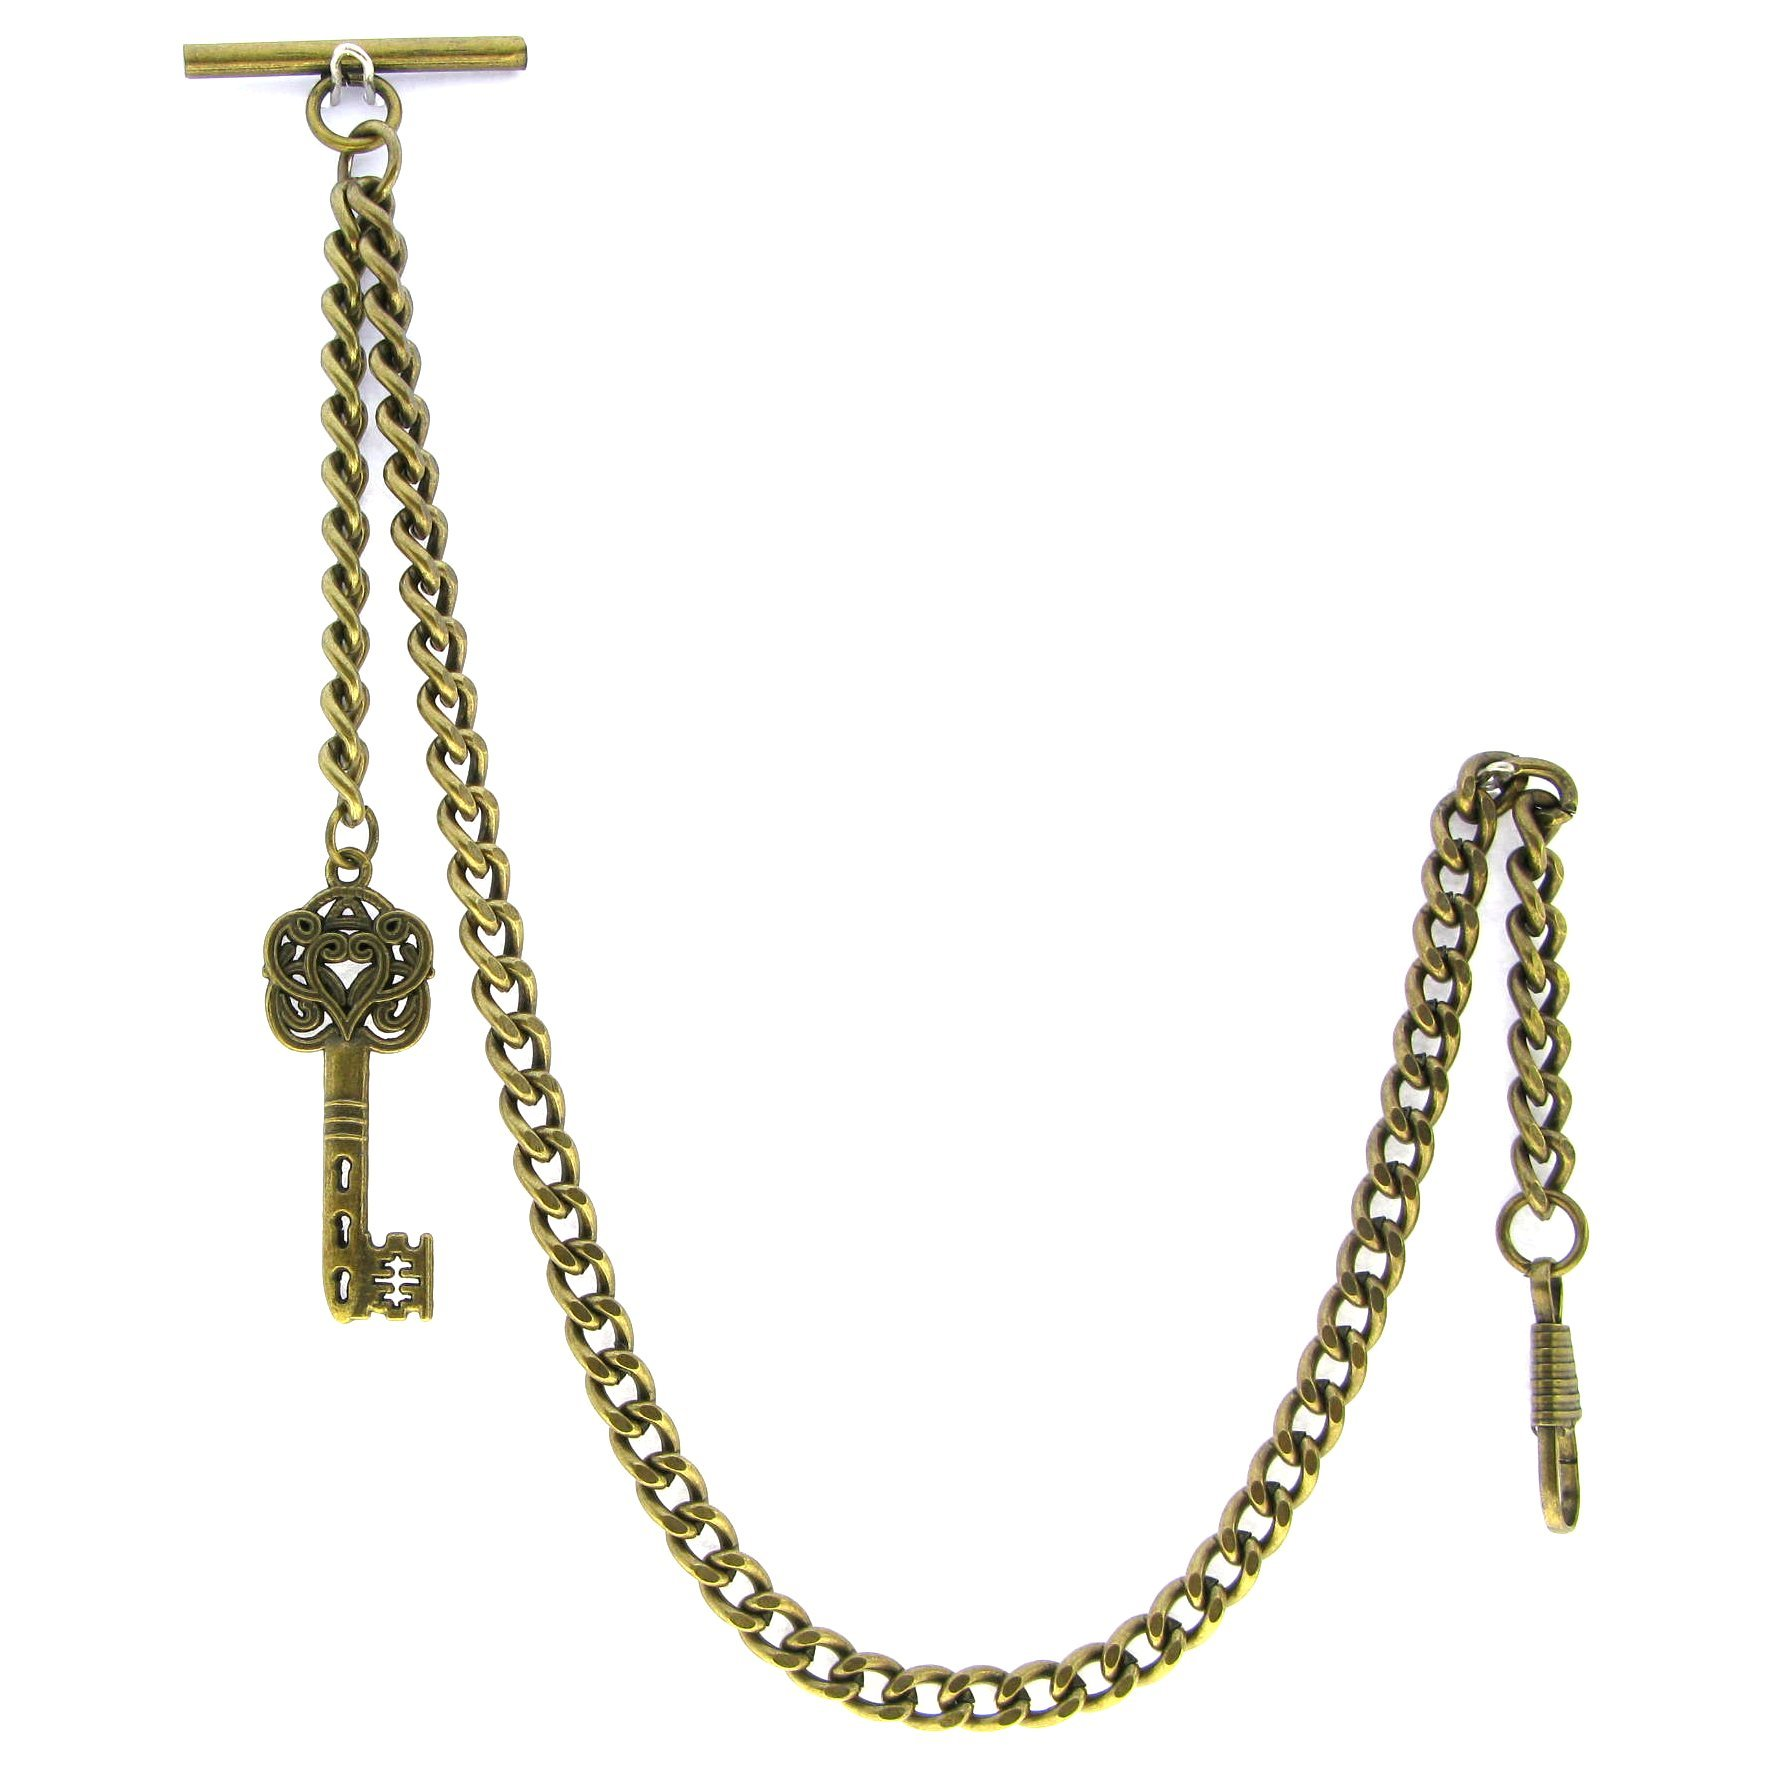 Albert Chain Pocket Watch Curb Link Chain Antique Brass Plating Key Fob T Bar AC06